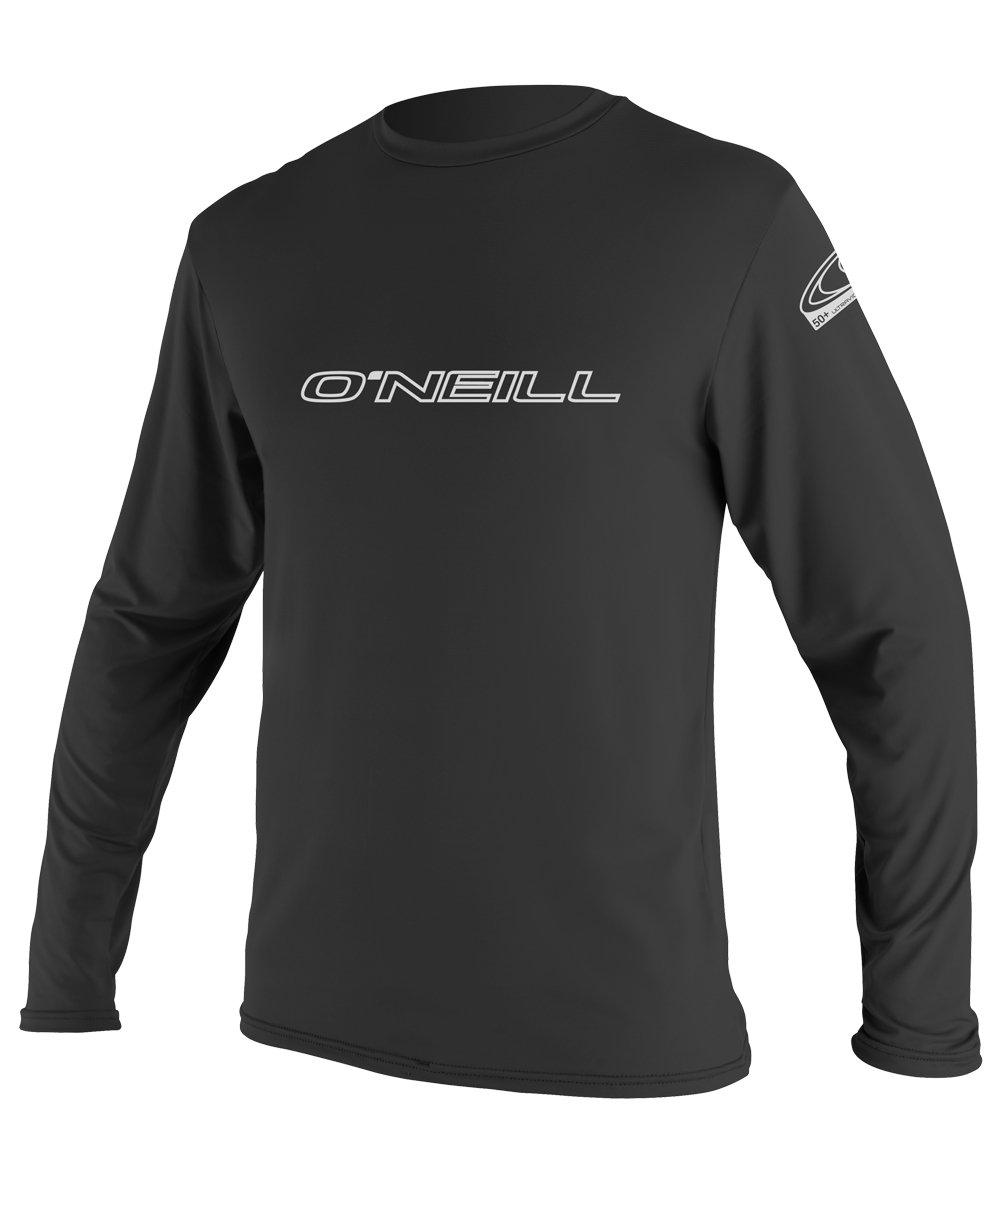 O'Neill   Men's Basic Skins UPF 50+ Long Sleeve Sun Shirt,Black,Medium